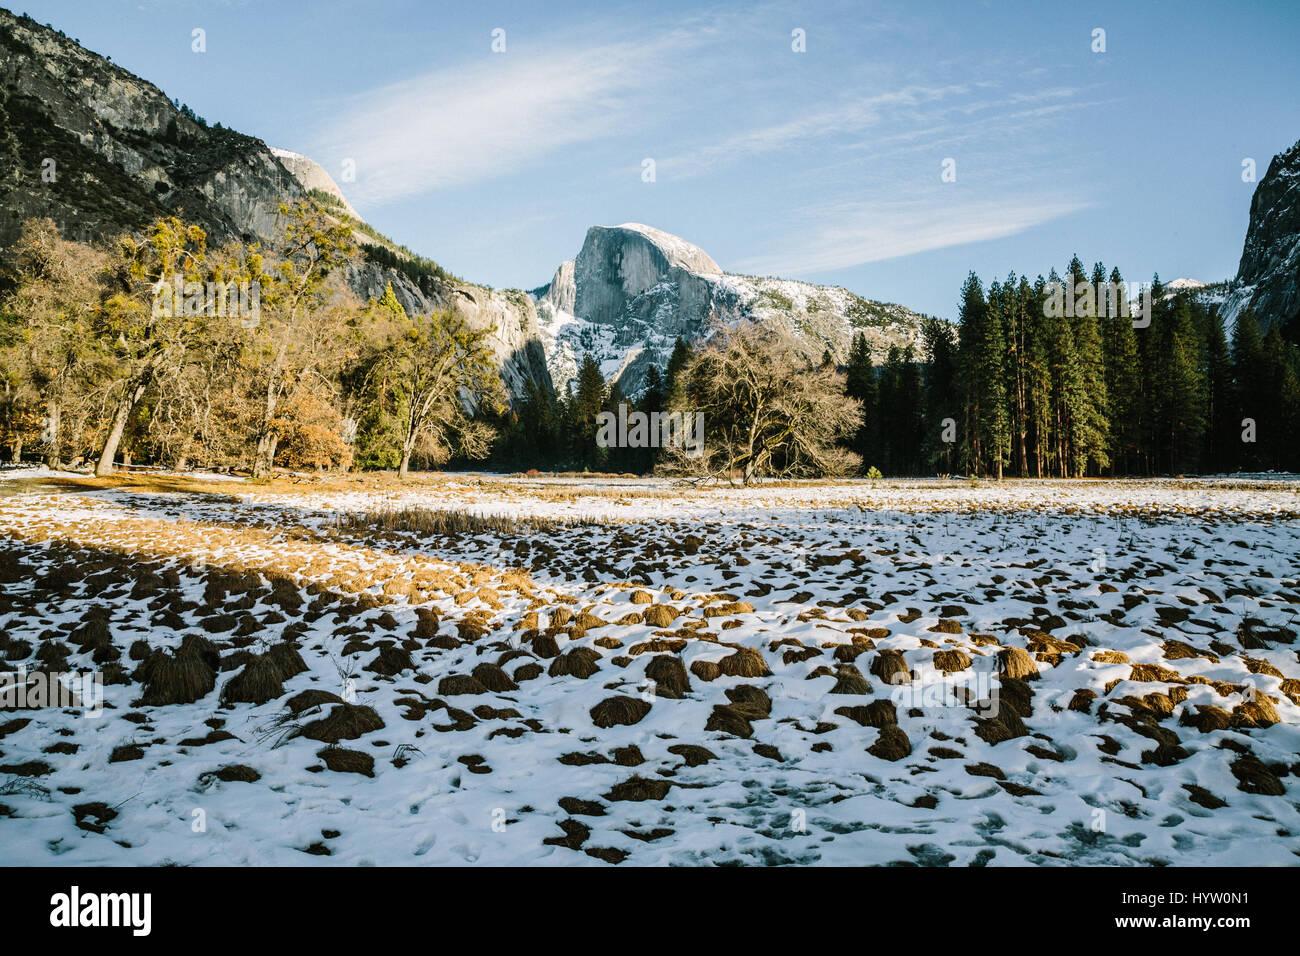 Blick ins Tal des Half Dome im Yosemite, Kalifornien, USA Stockbild